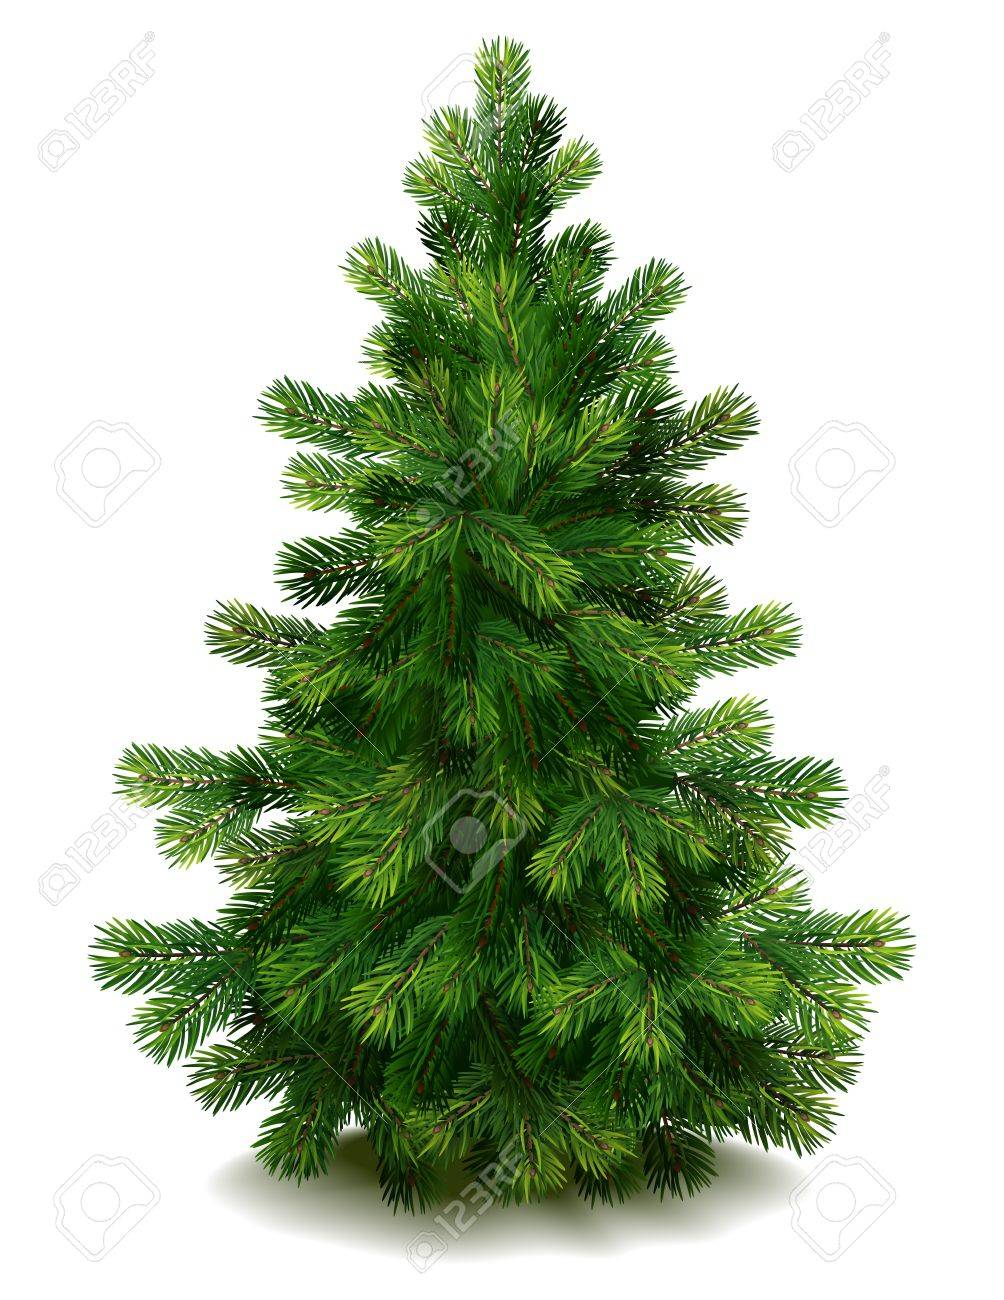 Vector illustration - pine tree on white background Stock Vector - 10627294